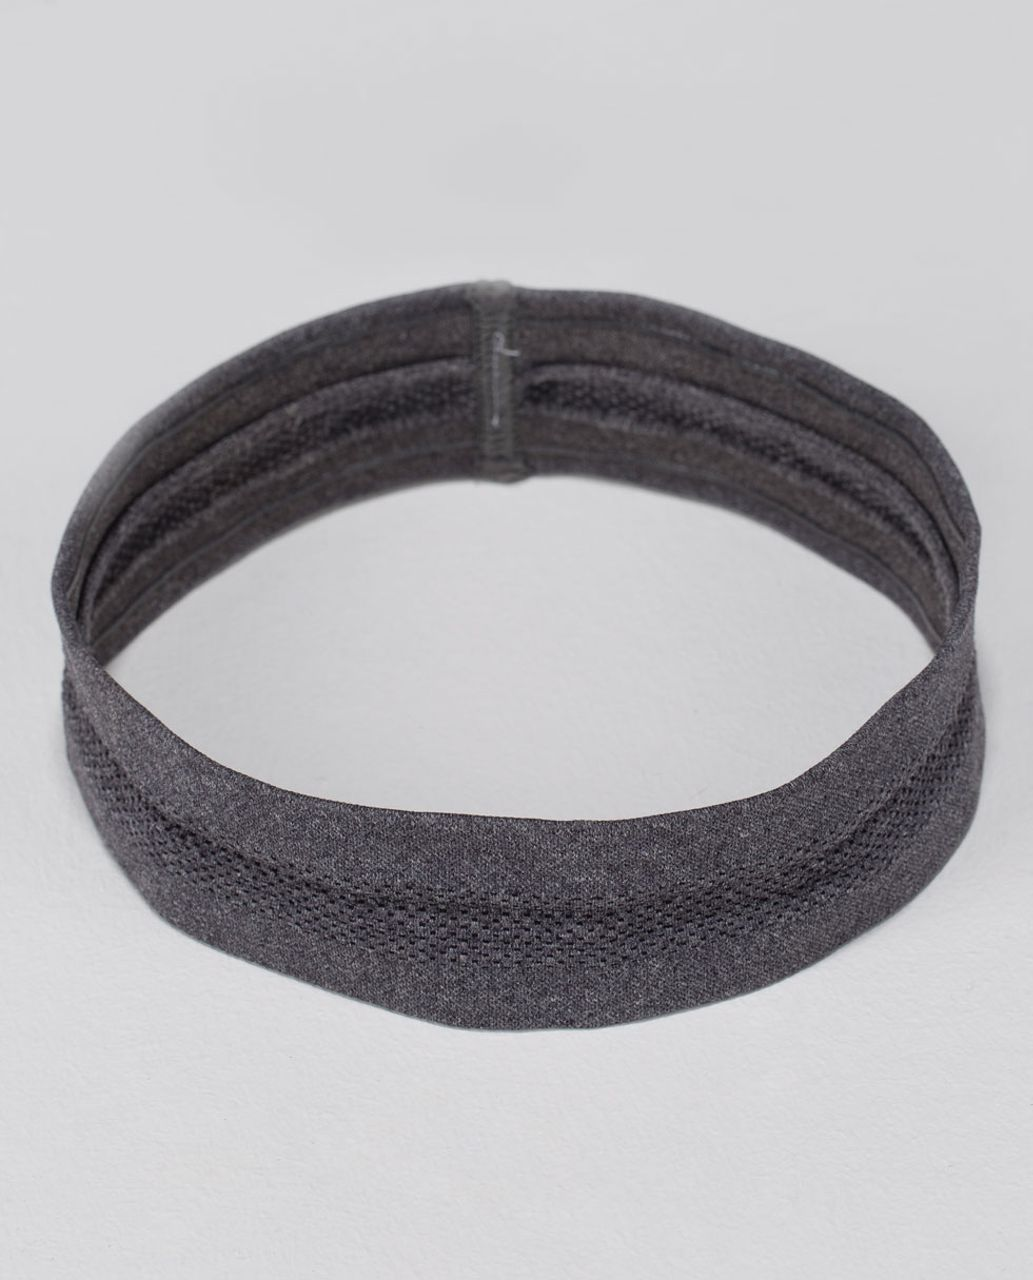 Lululemon Swiftly Headband - Heathered Cadet Blue